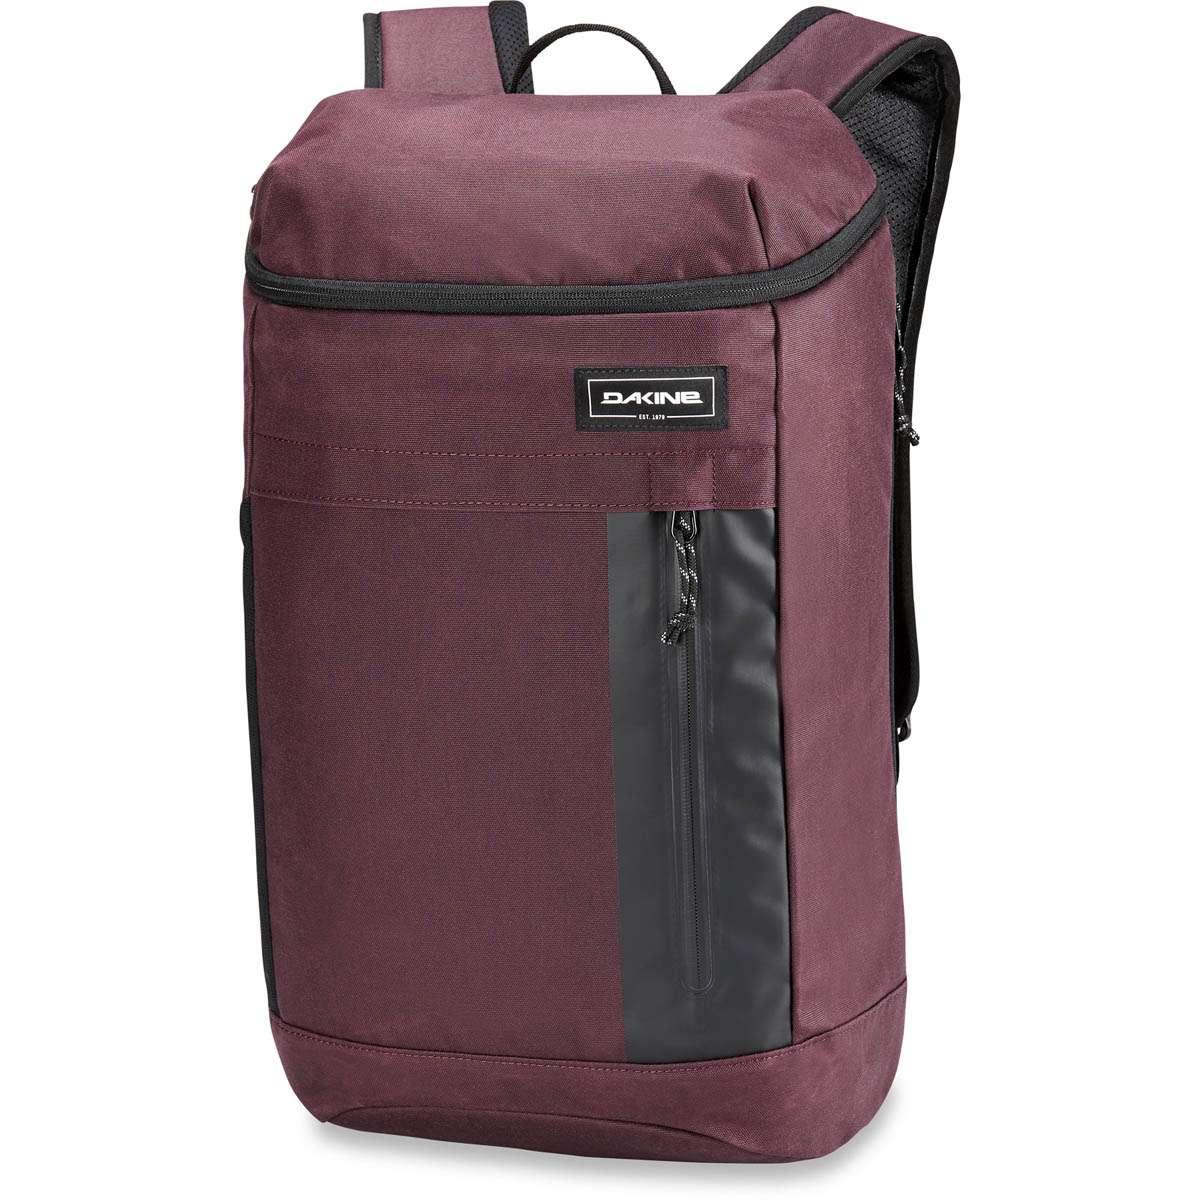 055df3ee19058 Dakine Concourse 25L Backpack Plum Shadow